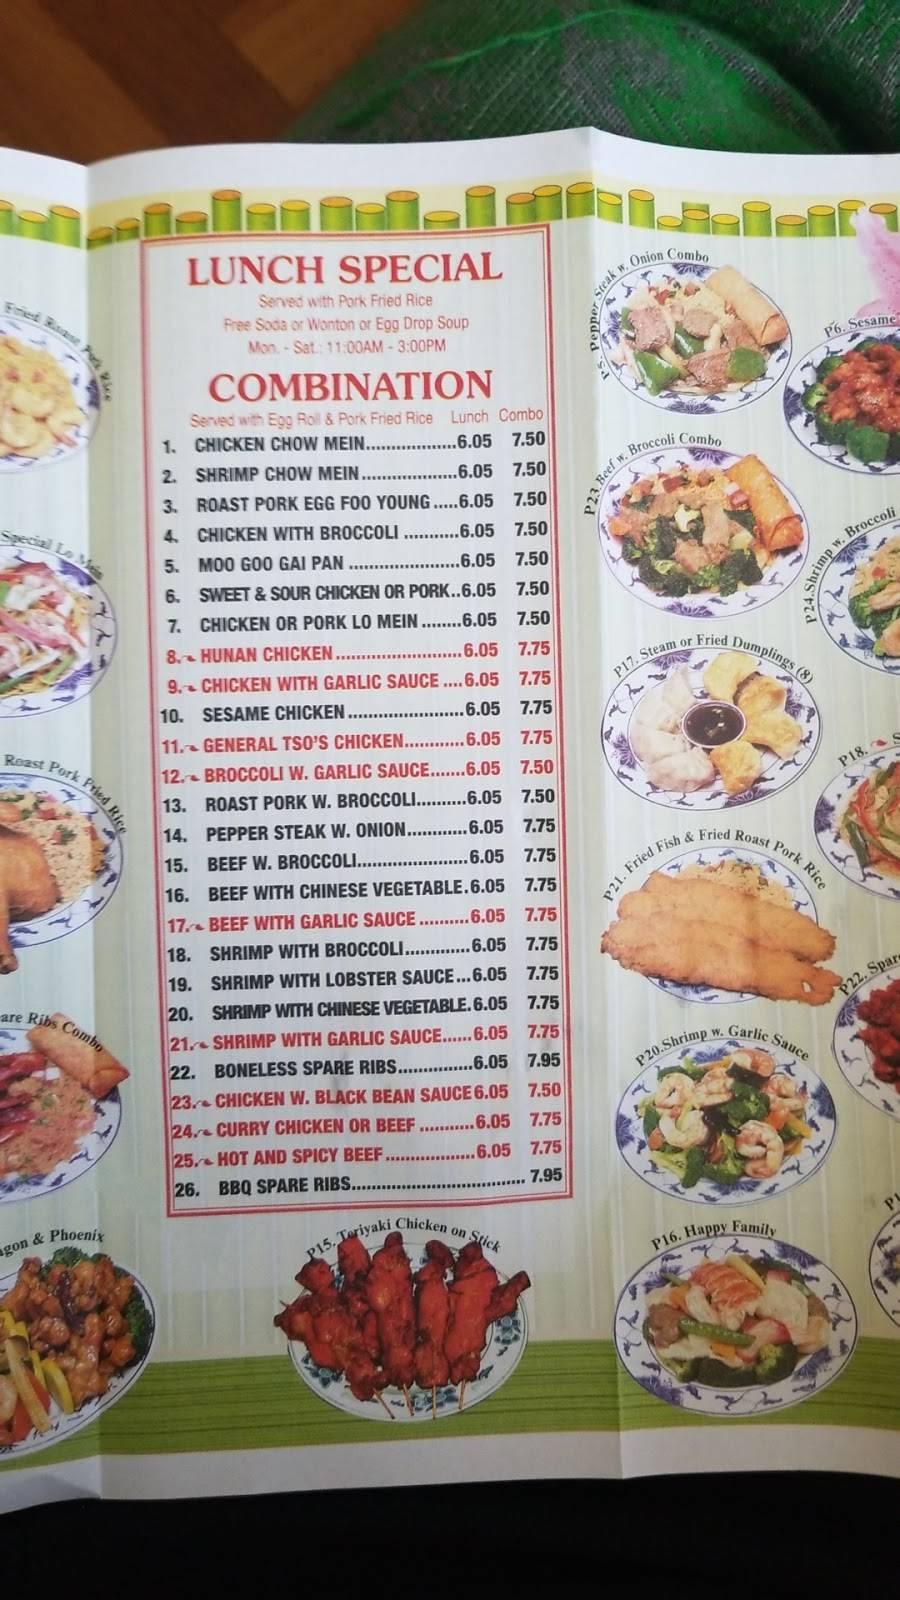 Chinatown Kitchen | restaurant | 450 60th St, West New York, NJ 07093, USA | 2018680630 OR +1 201-868-0630